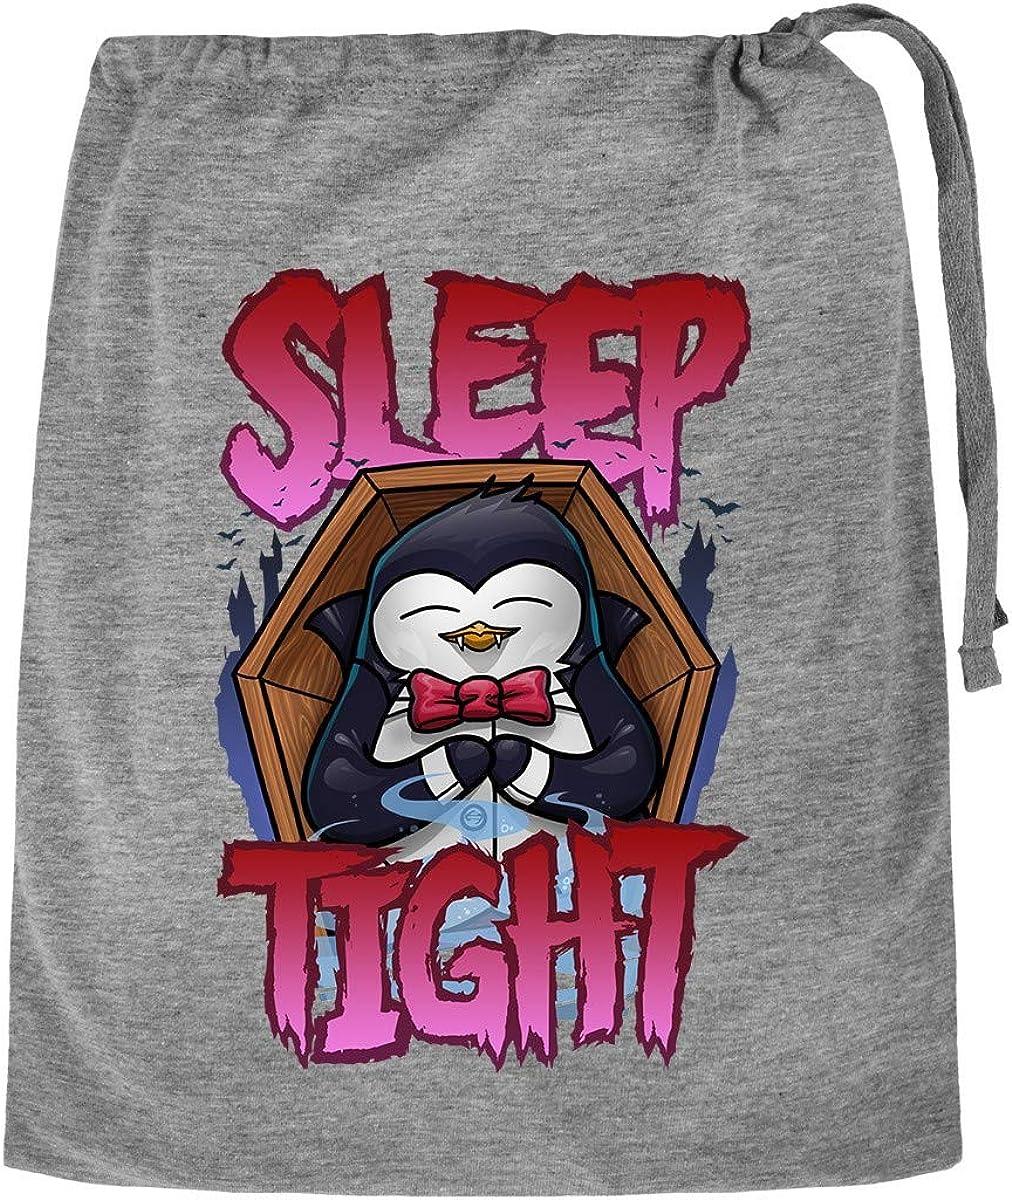 Psycho Sleep Repeat Short In Bag Women/'s White Psycho Penguin Pyjama Set Eat